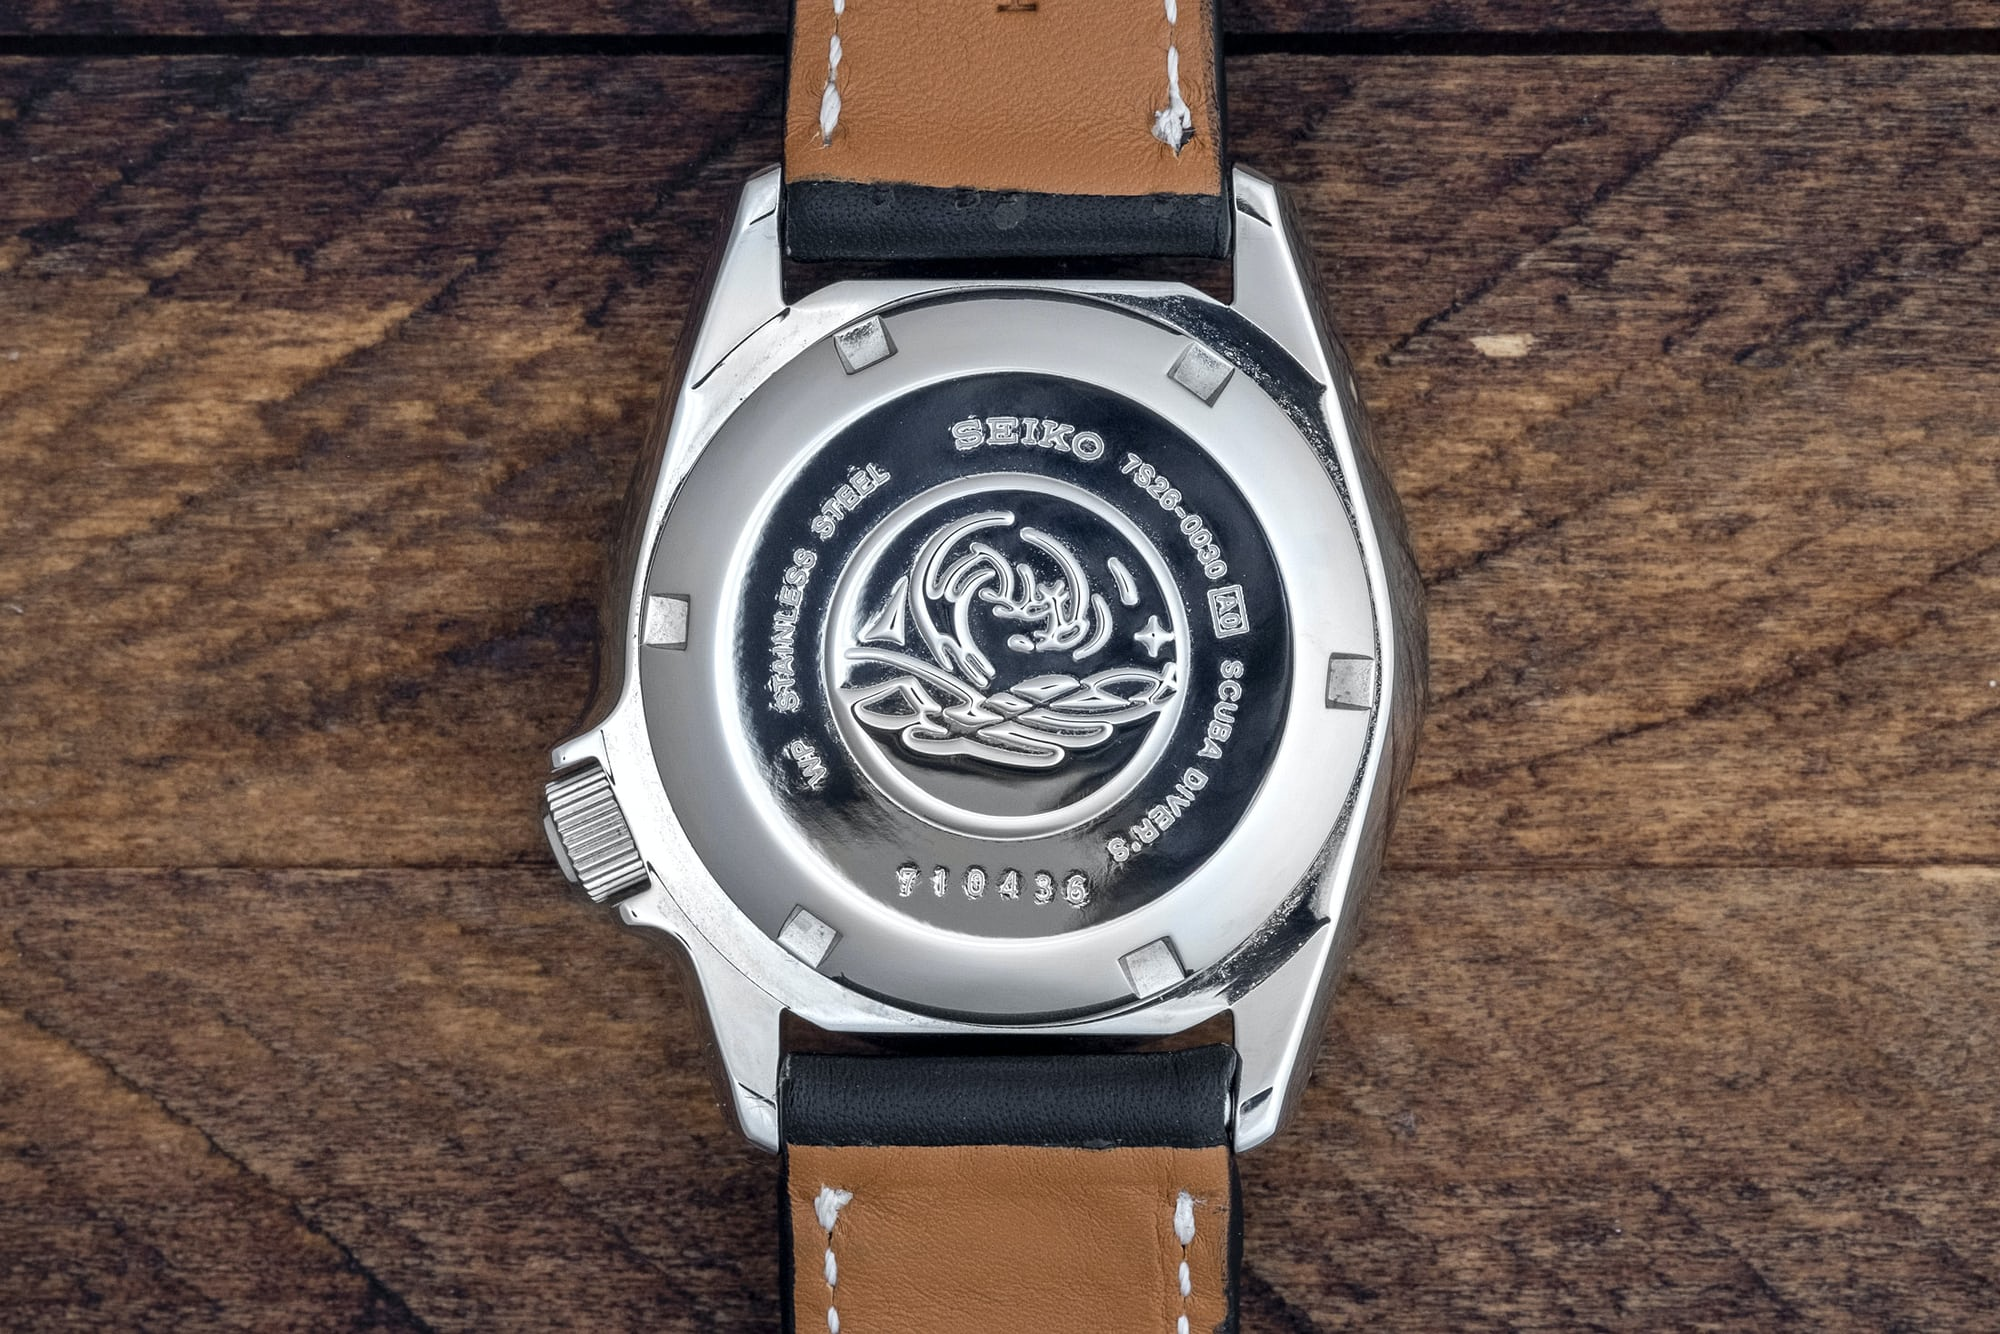 The Value Proposition: The Seiko SKX013 Dive Watch DSCF9124